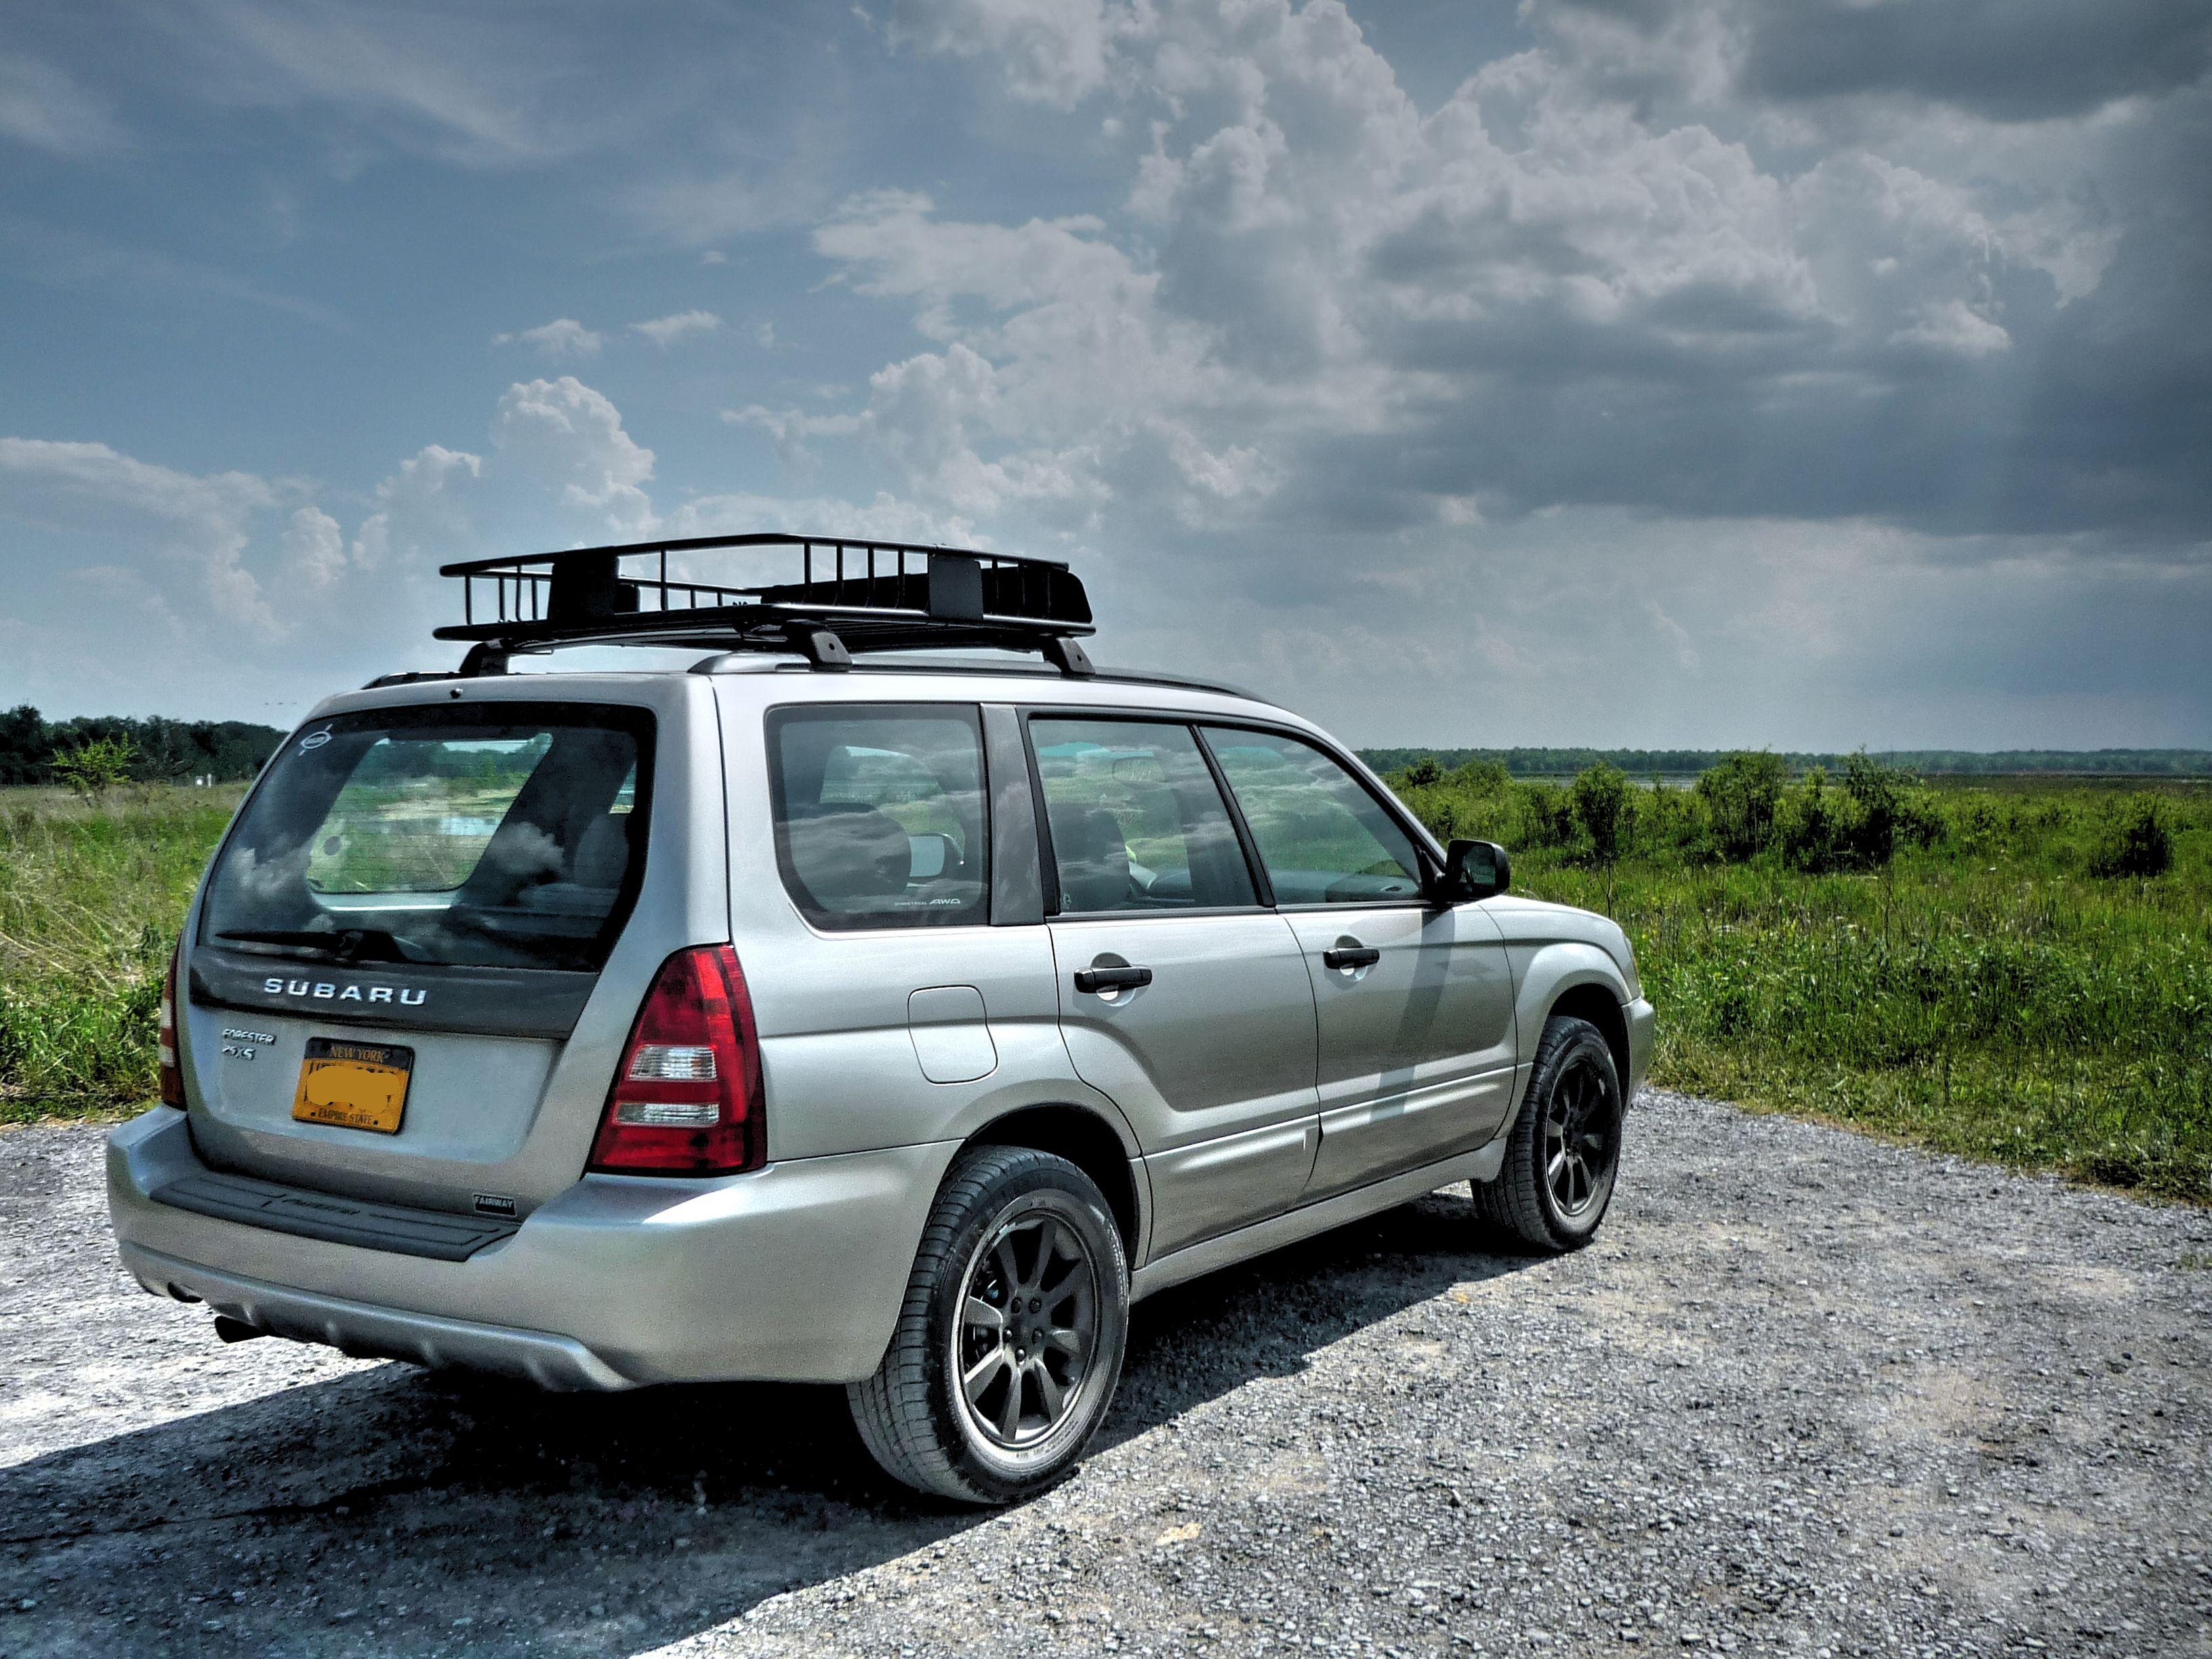 Crystal Gray 05 Xs Subaru Forester Outdoorsubarus Subaru Forester Subaru Forester Xt Subaru